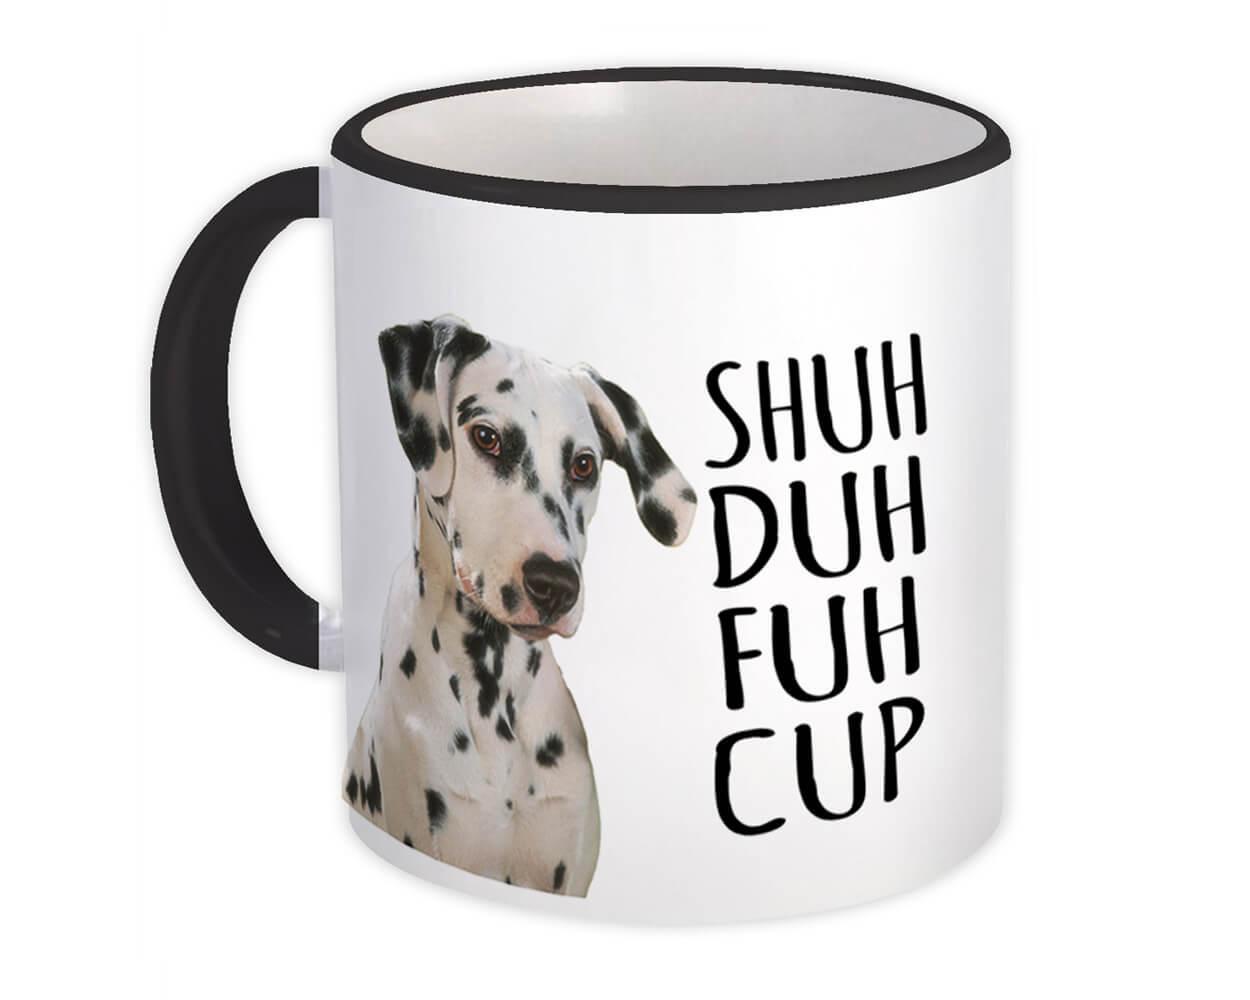 Shuh Duh Fuh Cup : Gift Mug Dog Dalmatian Cute Funny Office Coworker